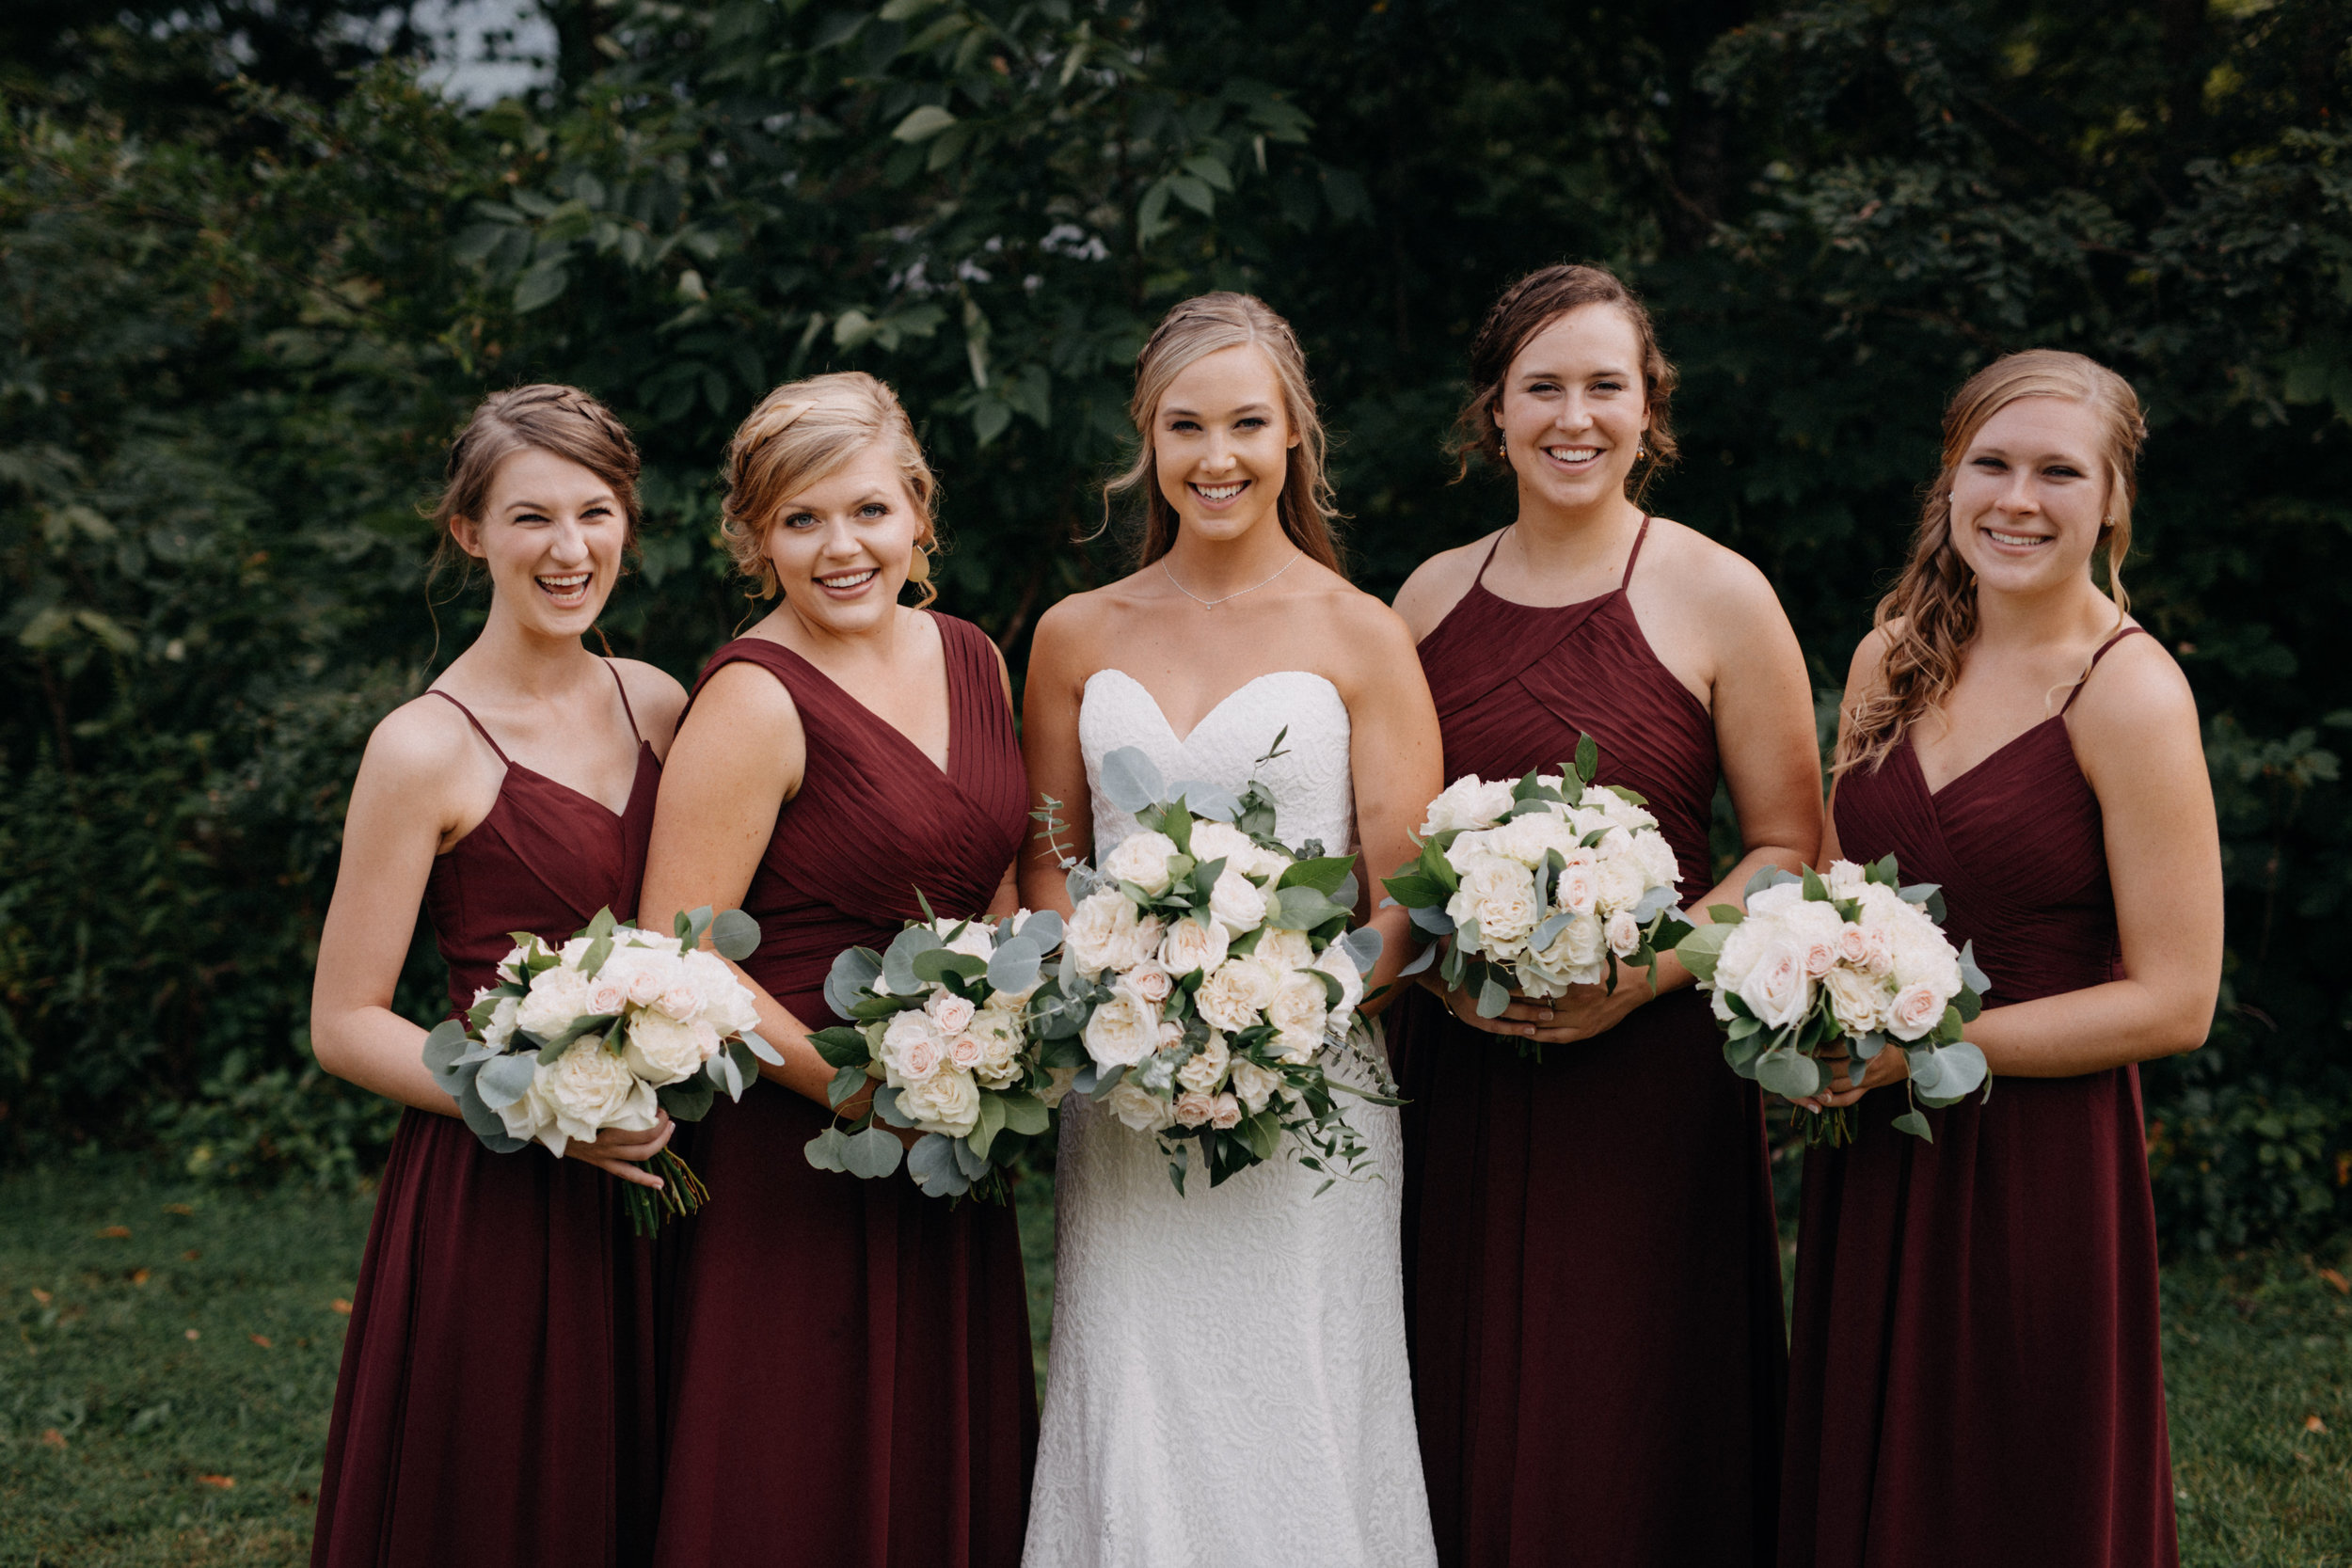 Burgess-WEB-WeddingParty-4.jpeg